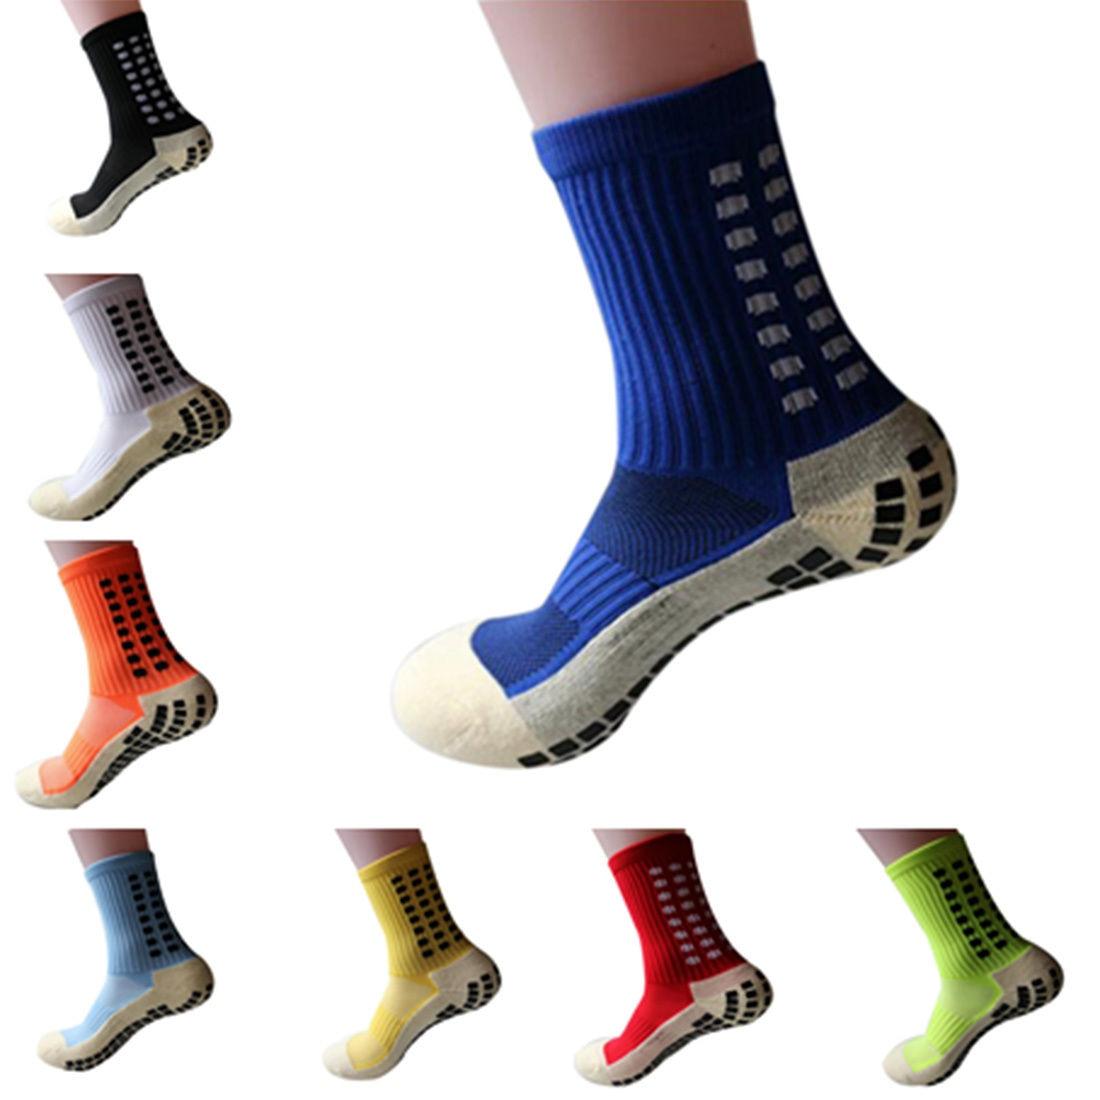 Anti-Slip Breathable Unisex Anti Slip Running Soccer Cotton Football Running Sport Socks Absorb Sweat Men Women Cycling Socks